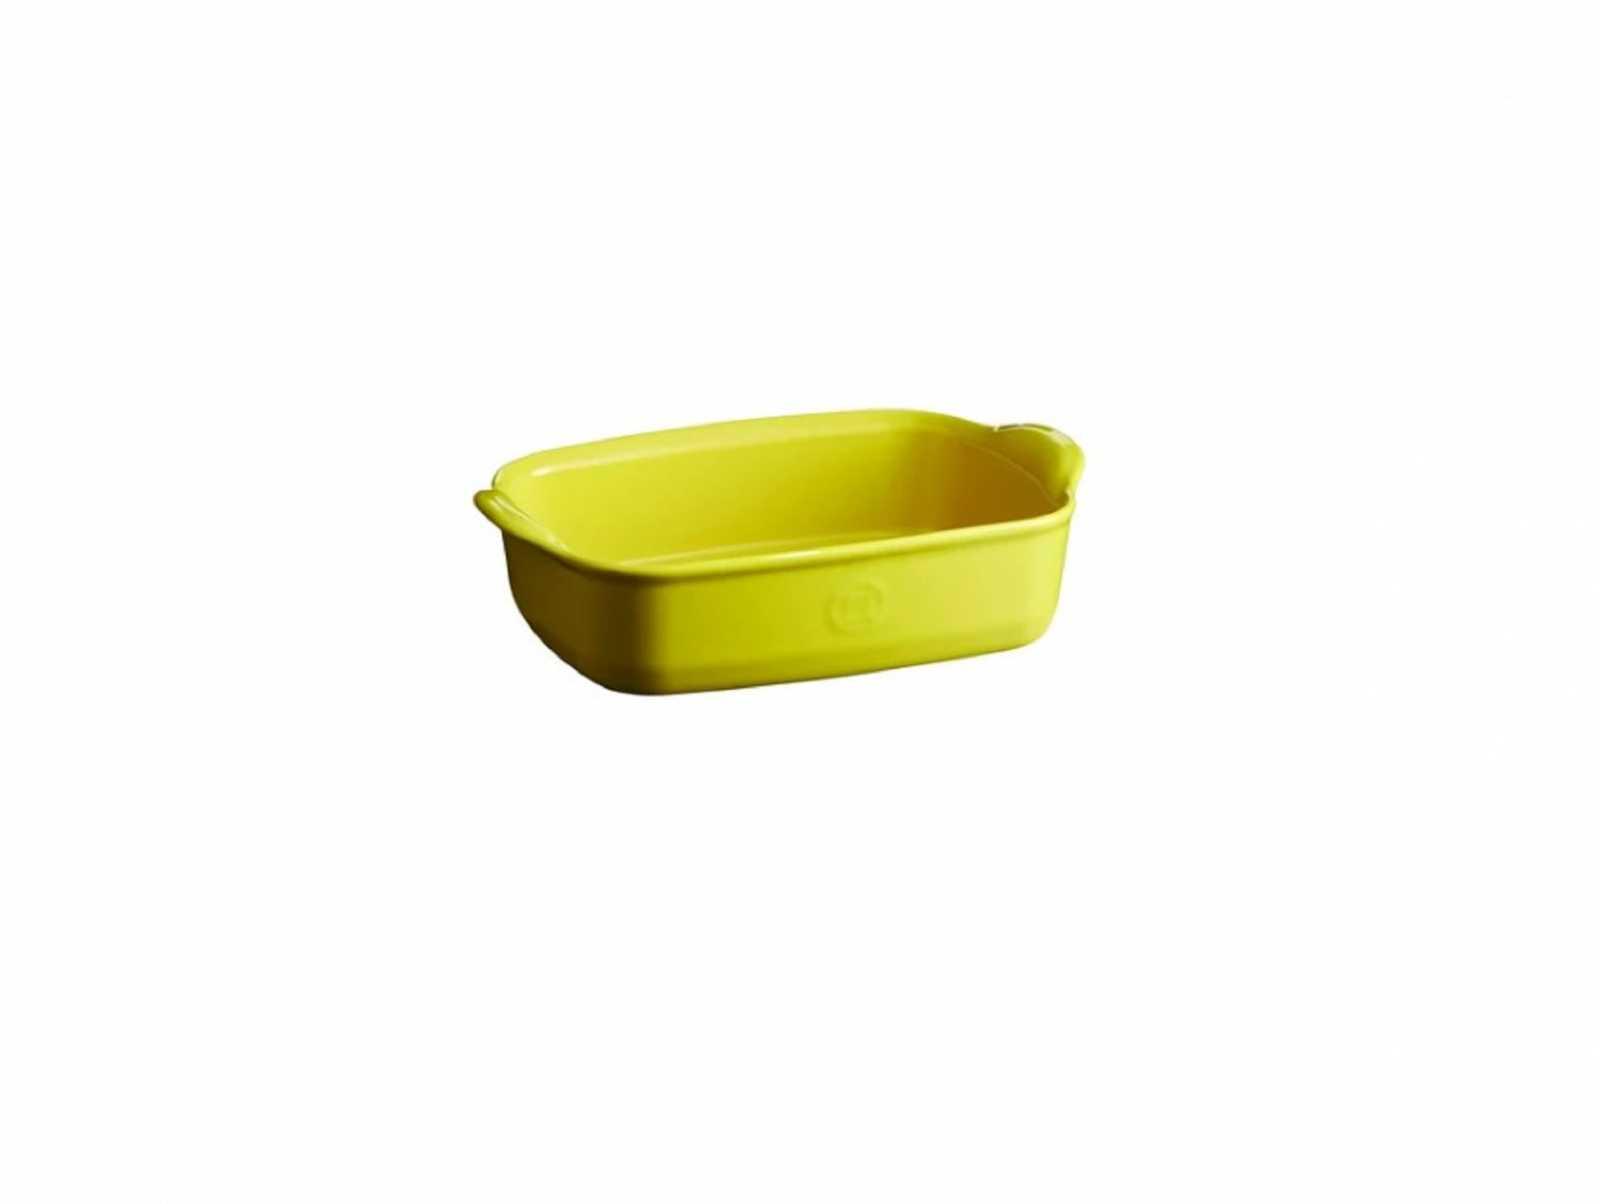 Онлайн каталог PROMENU: Форма для запекания Emile Henry OVENWARE, 22х14 см, желтый                               909649